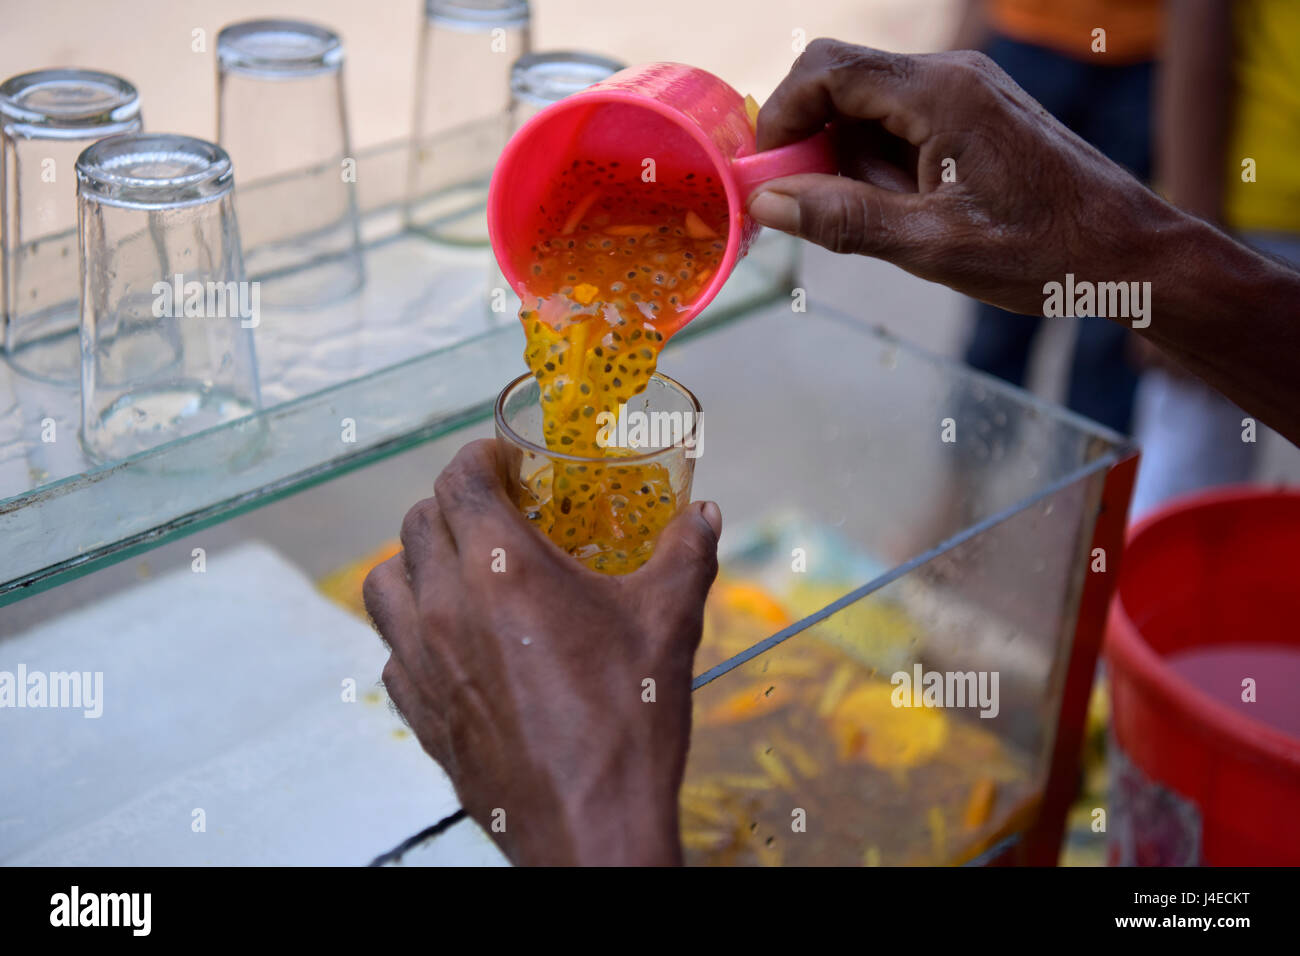 DHAKA, BANGLADESH - MAY 13, 2017: A Bangladeshi street vendor sells unhygienic cold fruit juice in Dhaka, Bangladesh. - Stock Image